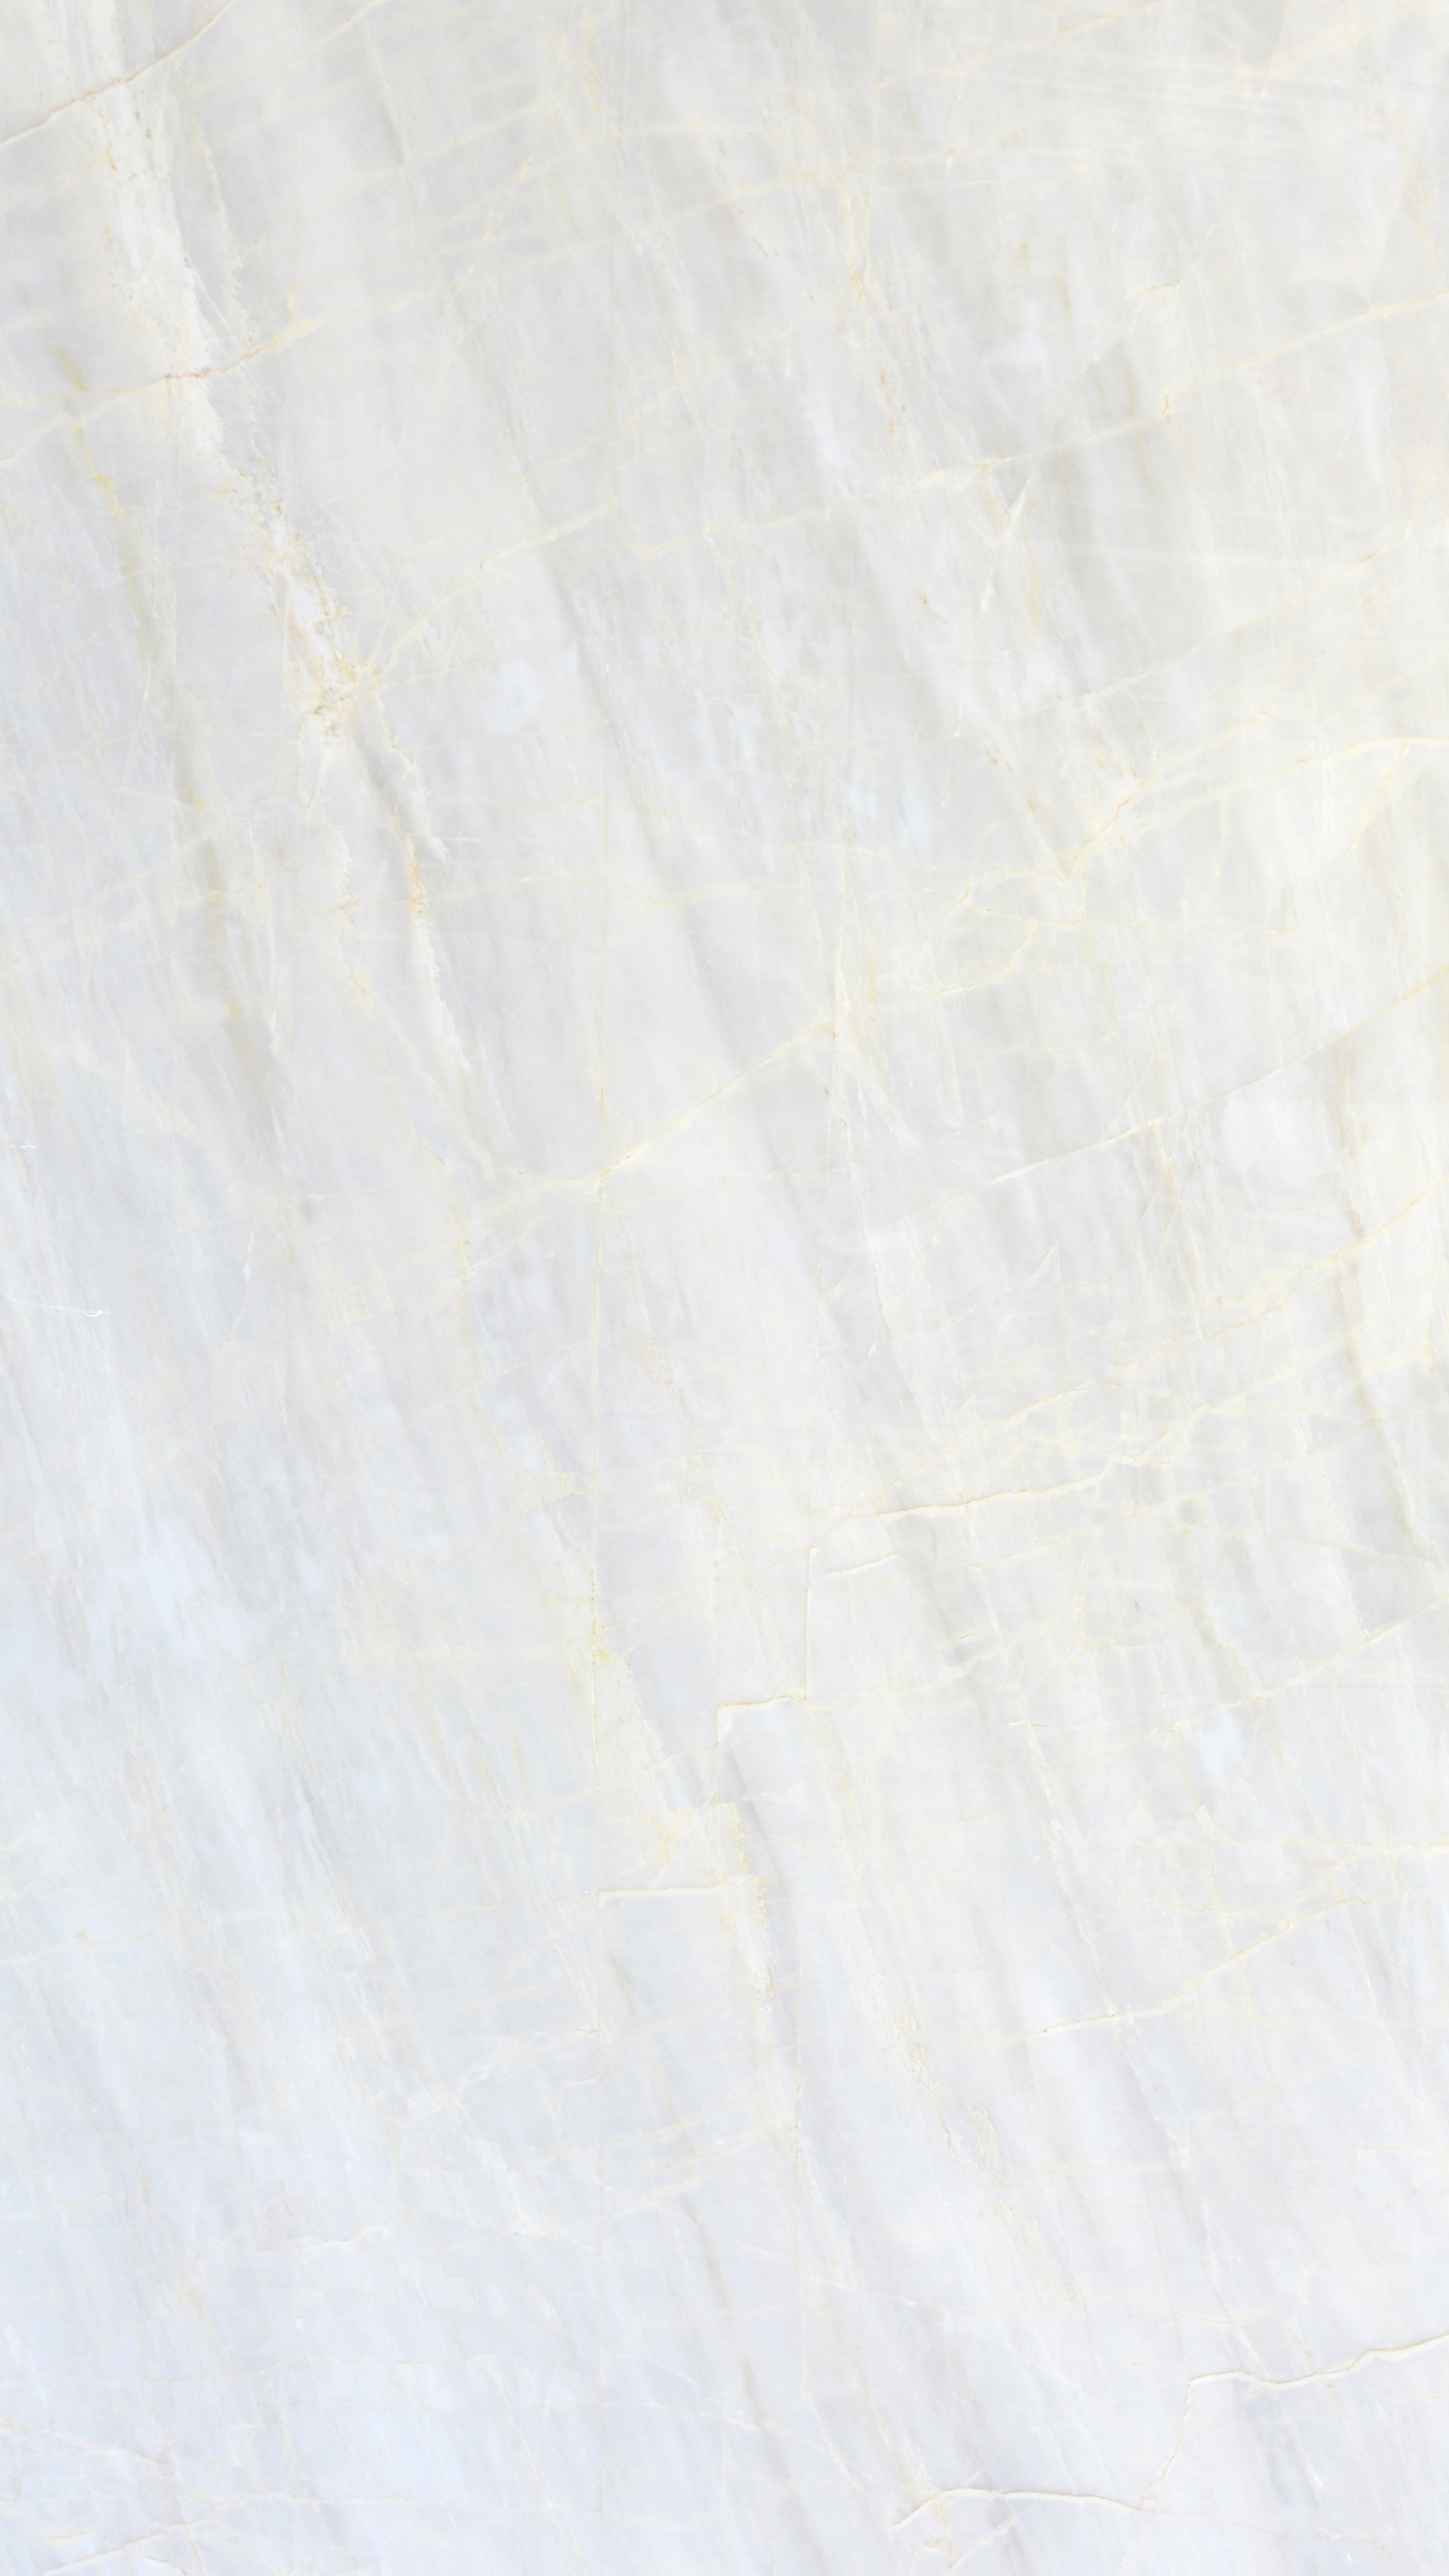 Afyon White & Gold Marble